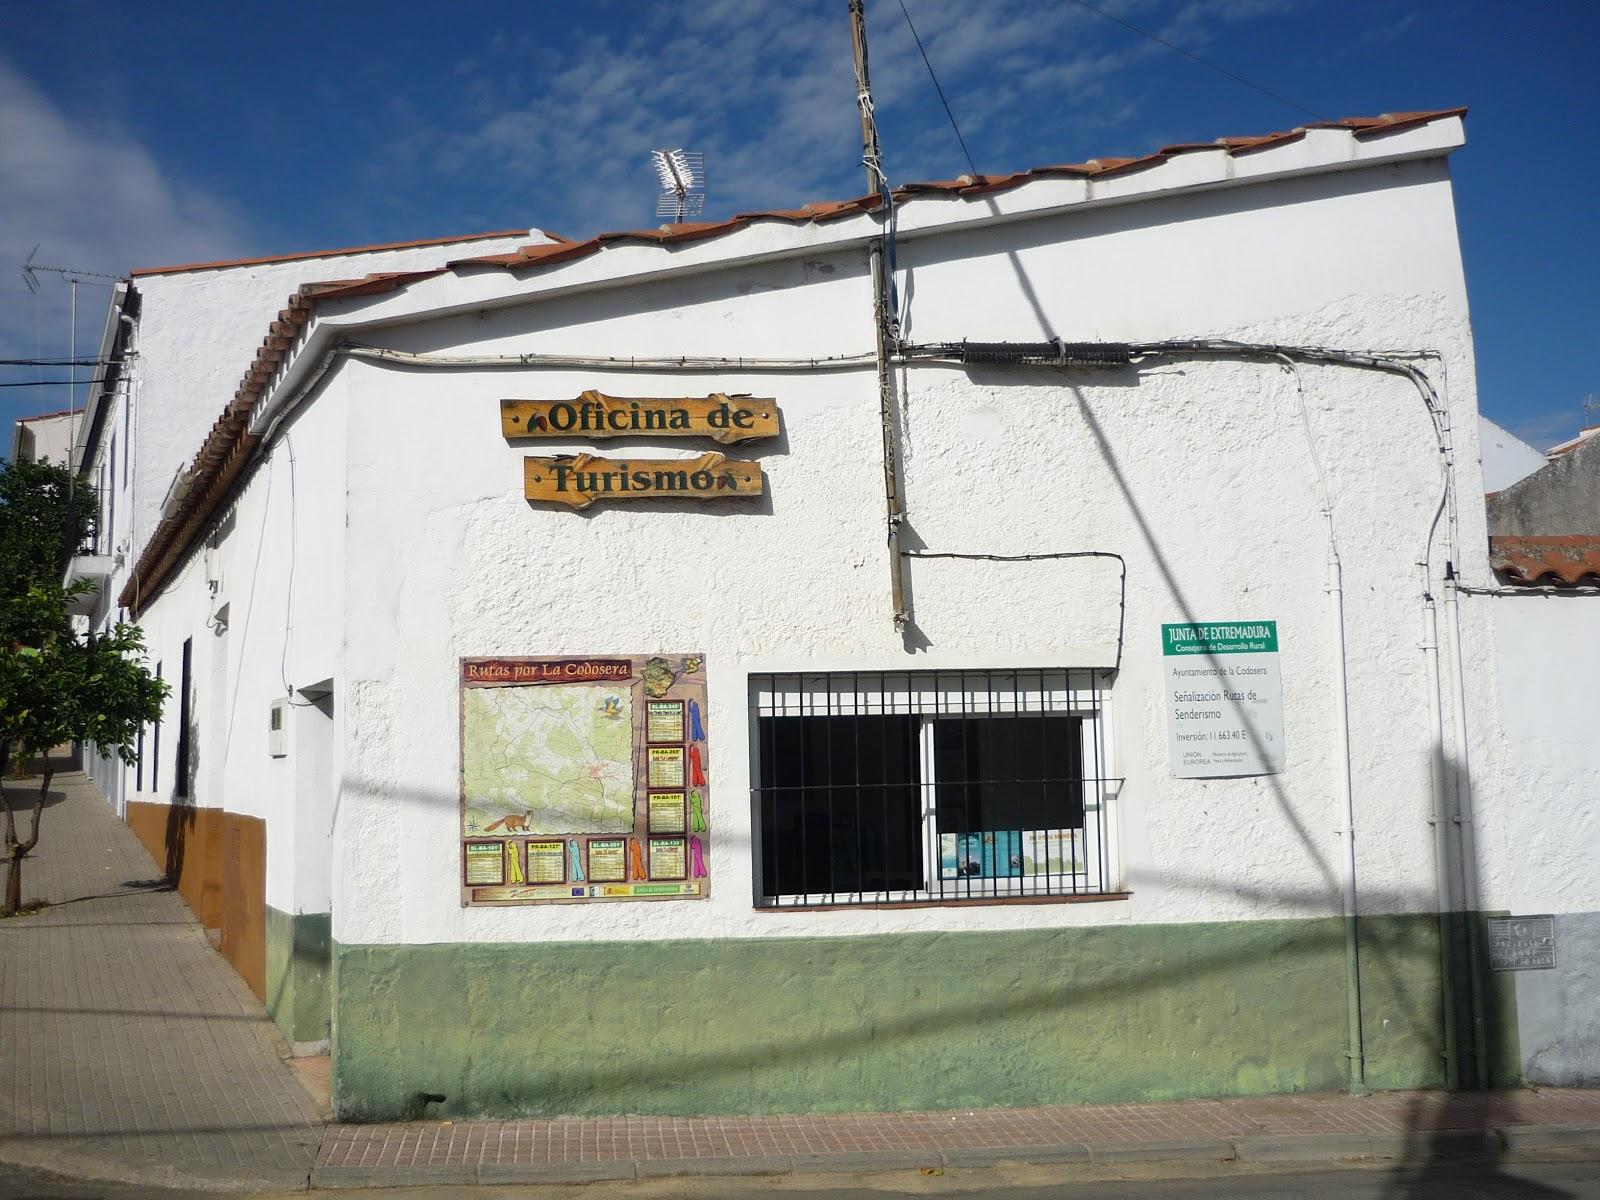 Turismo la codosera presentaci n for Oficina turismo badajoz